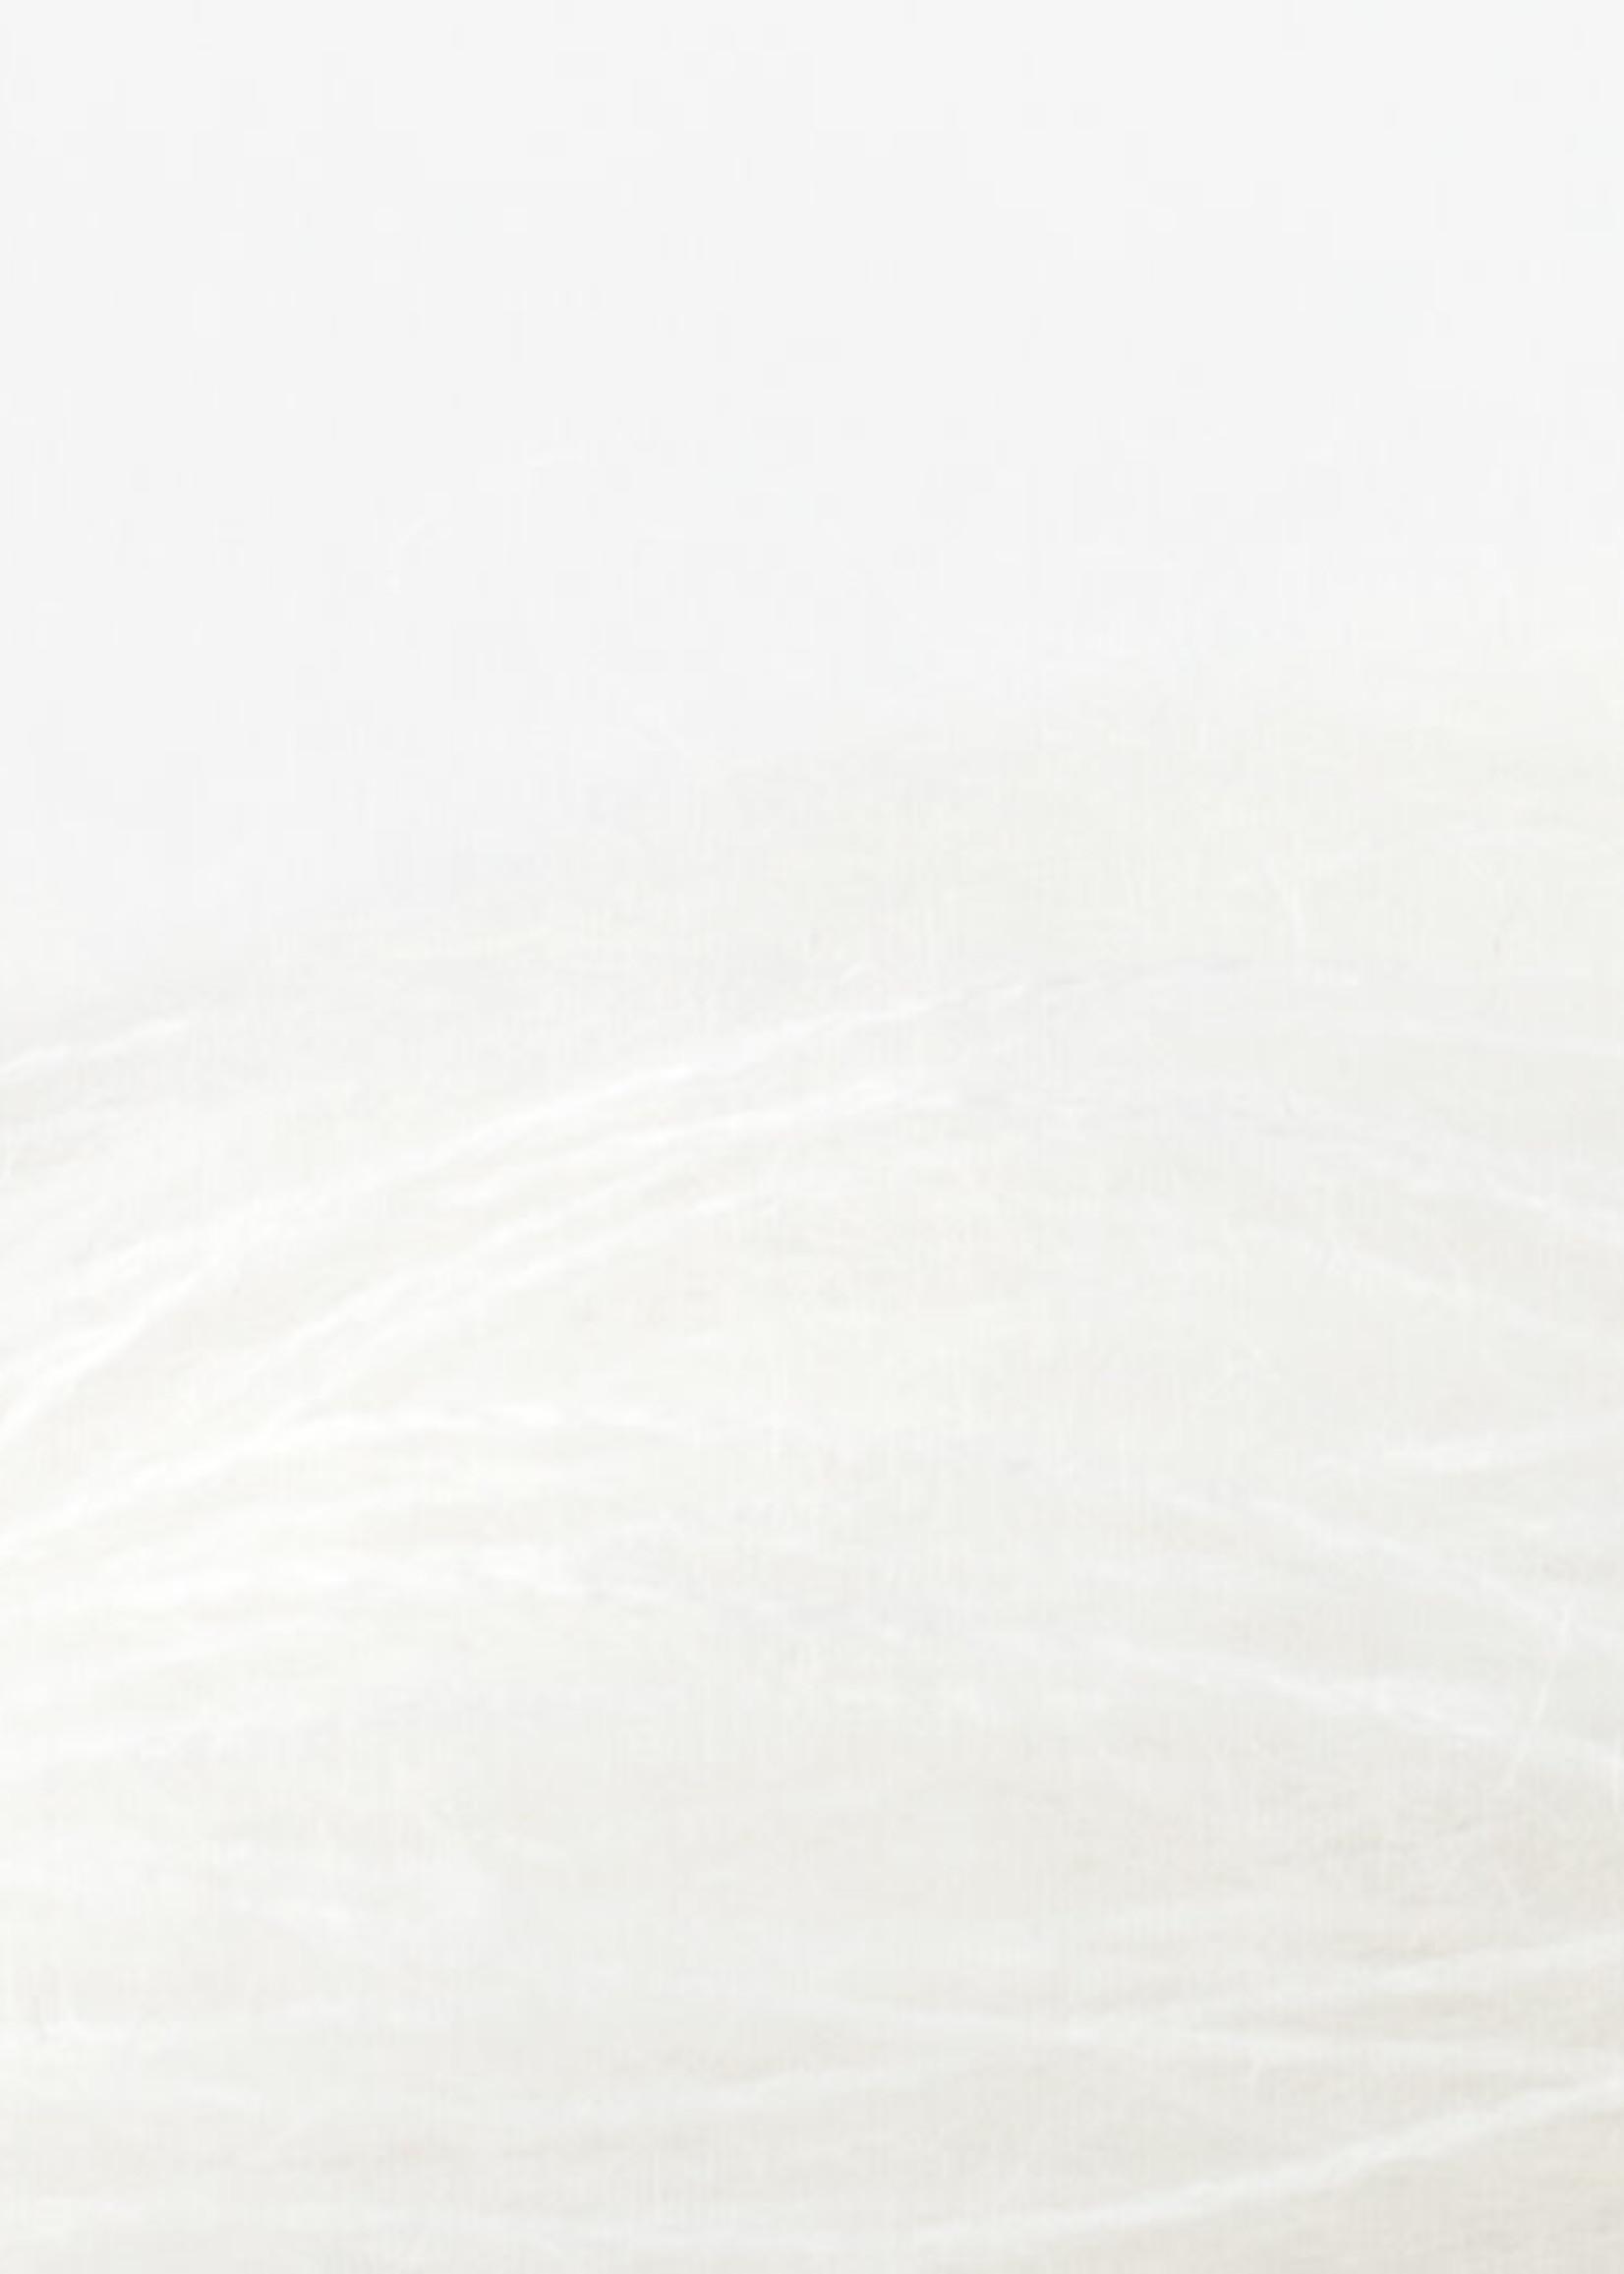 Shibui Shibui Silk Cloud #2180 White